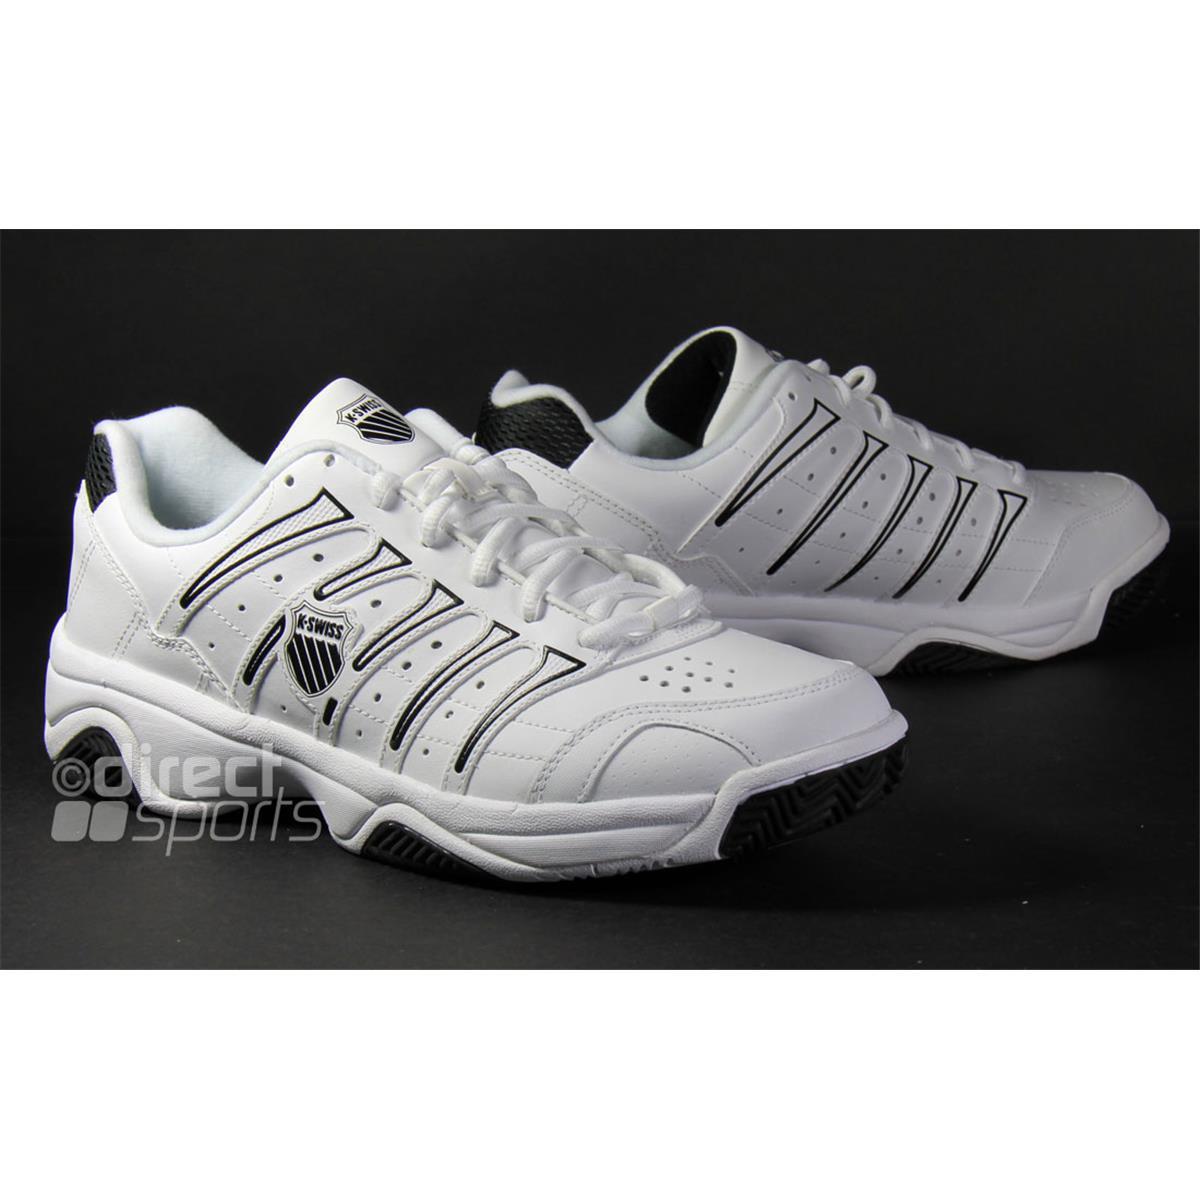 k swiss grancourt ii mens white black tennis shoes by